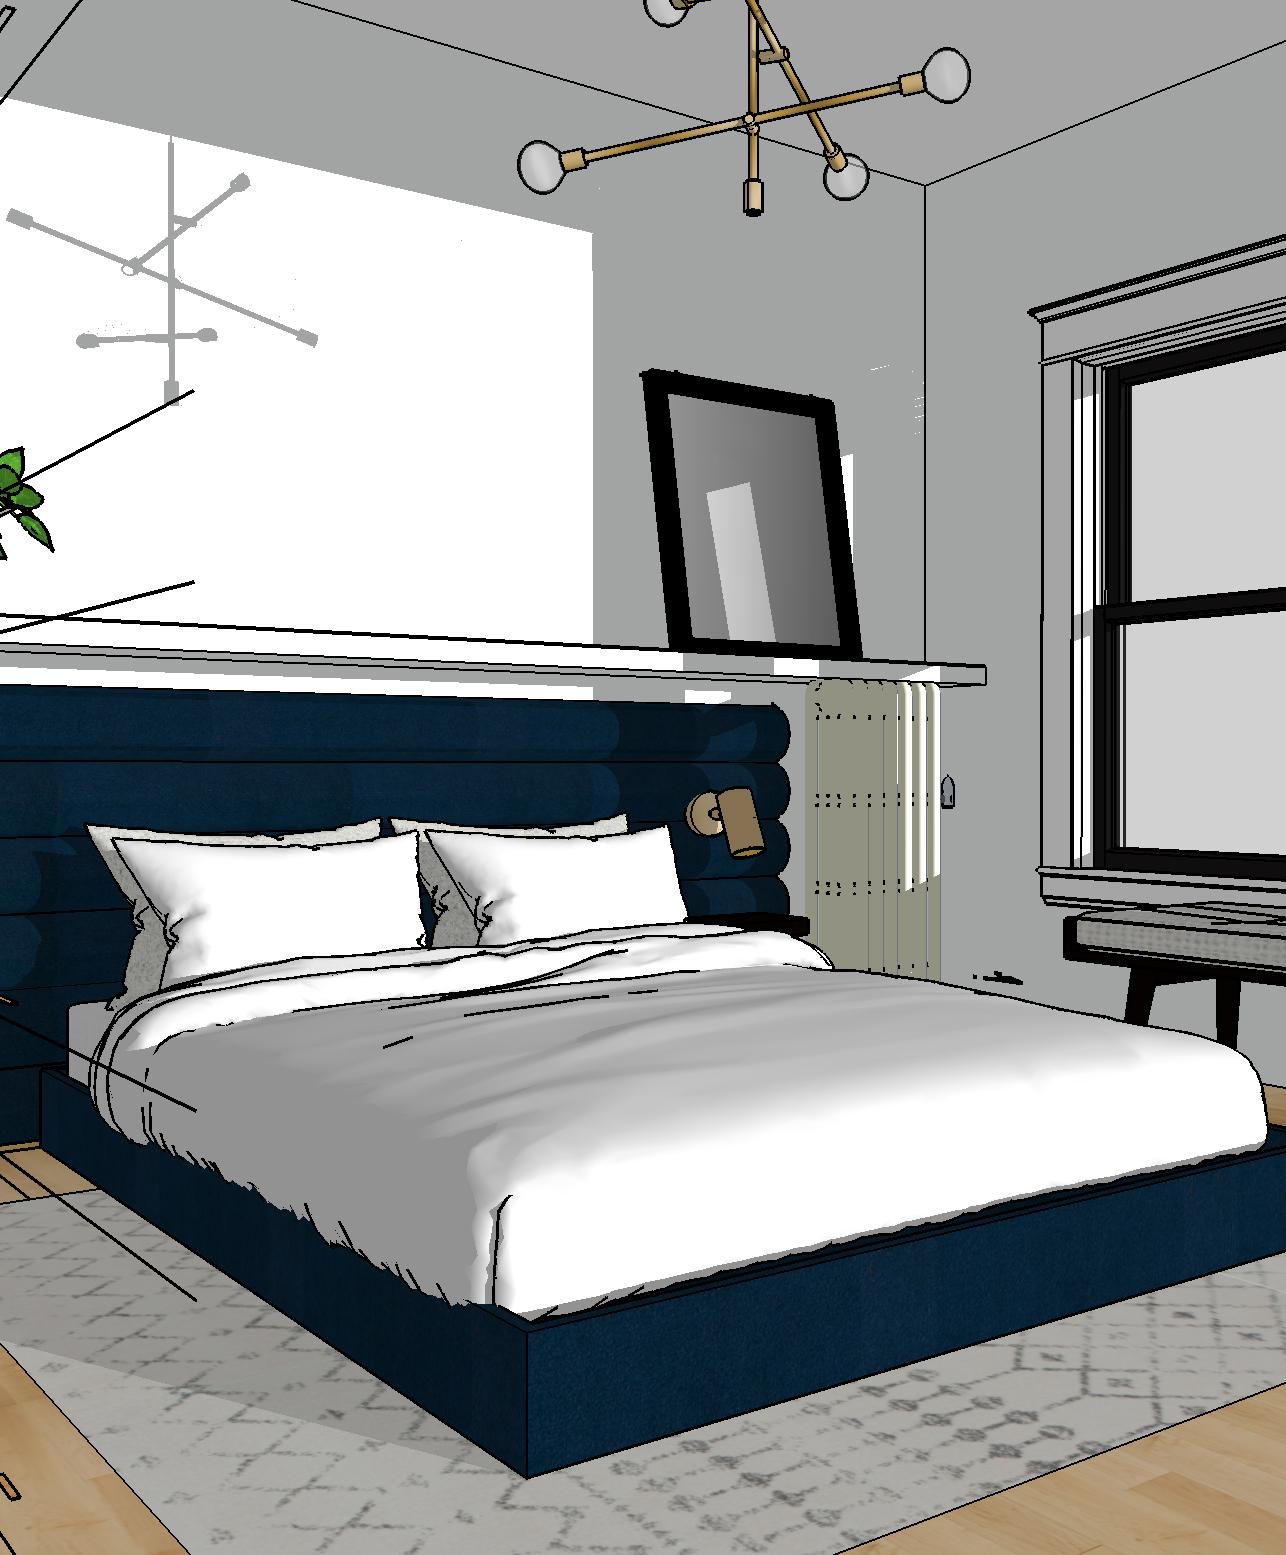 One Room Challenge Week 1 | Brass & Blue in the Guest Bedroom